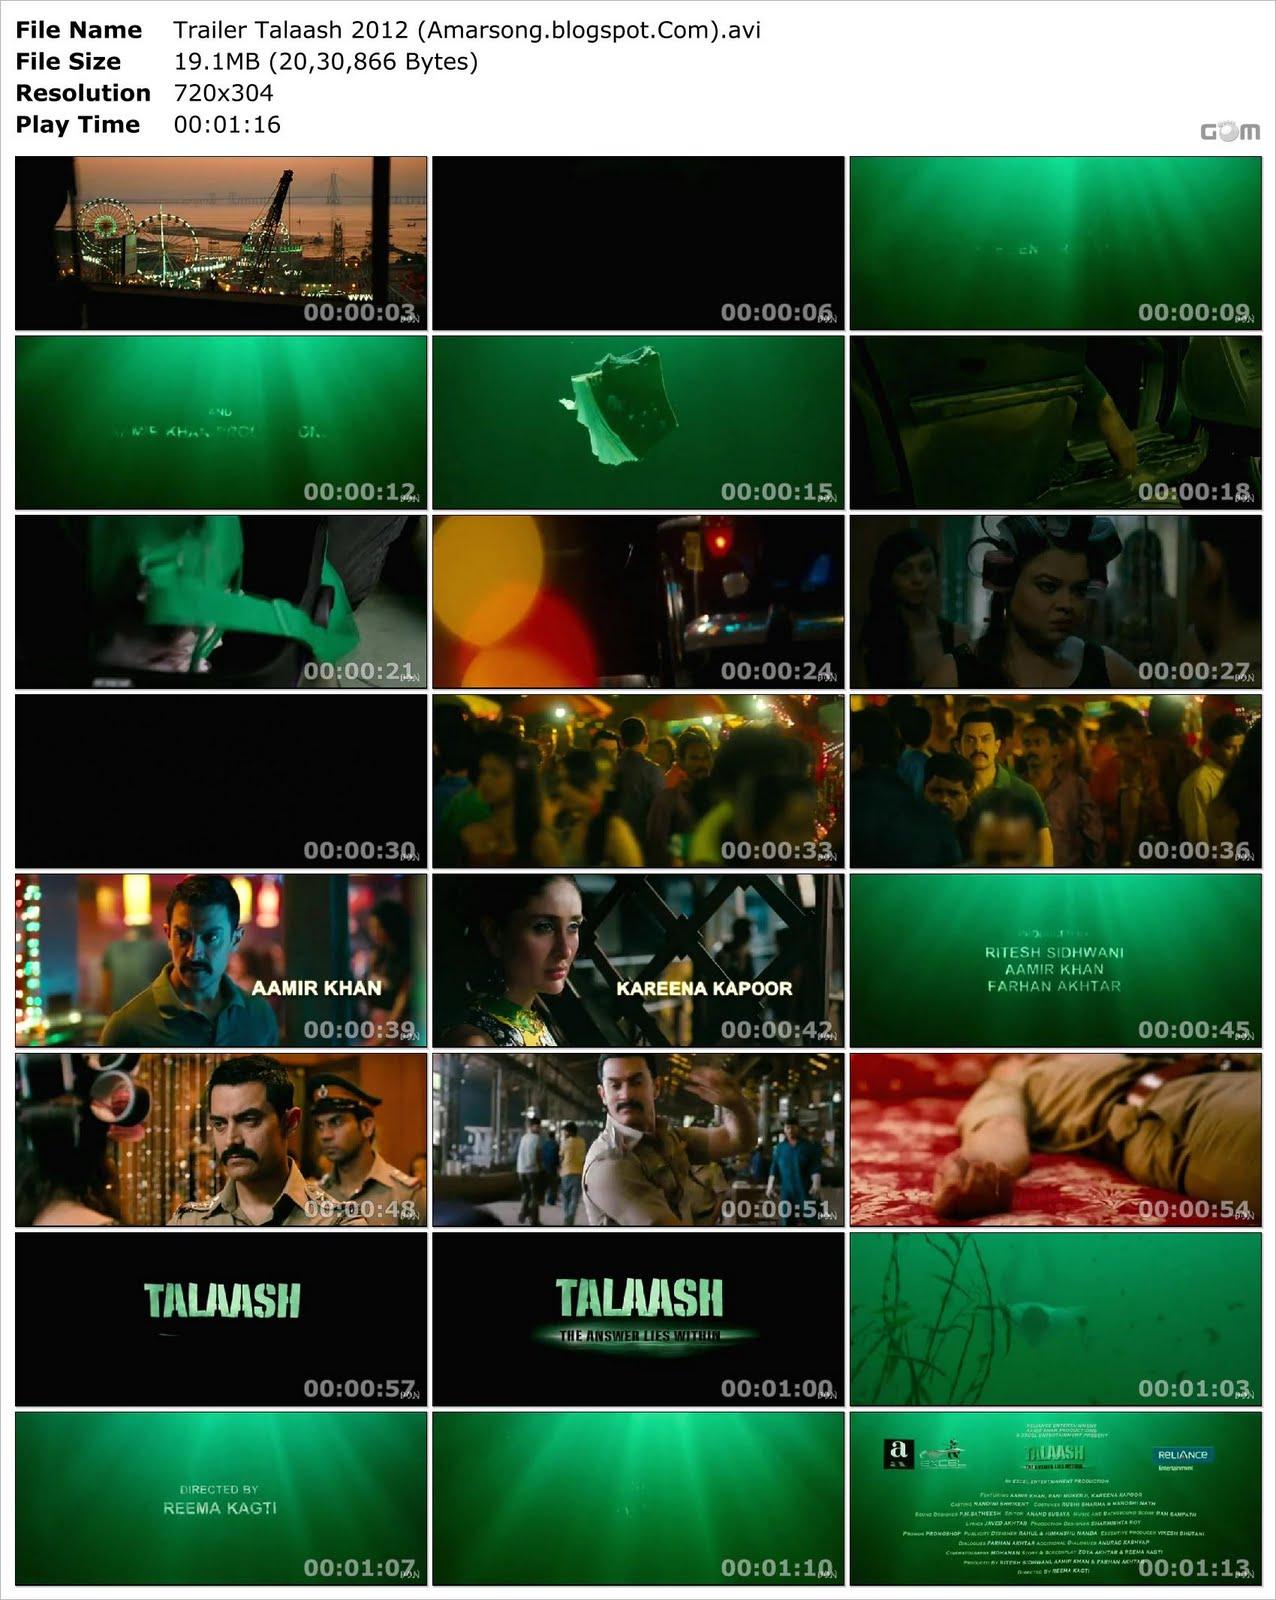 Talaash (2012) Official Trailer Download AVI Format